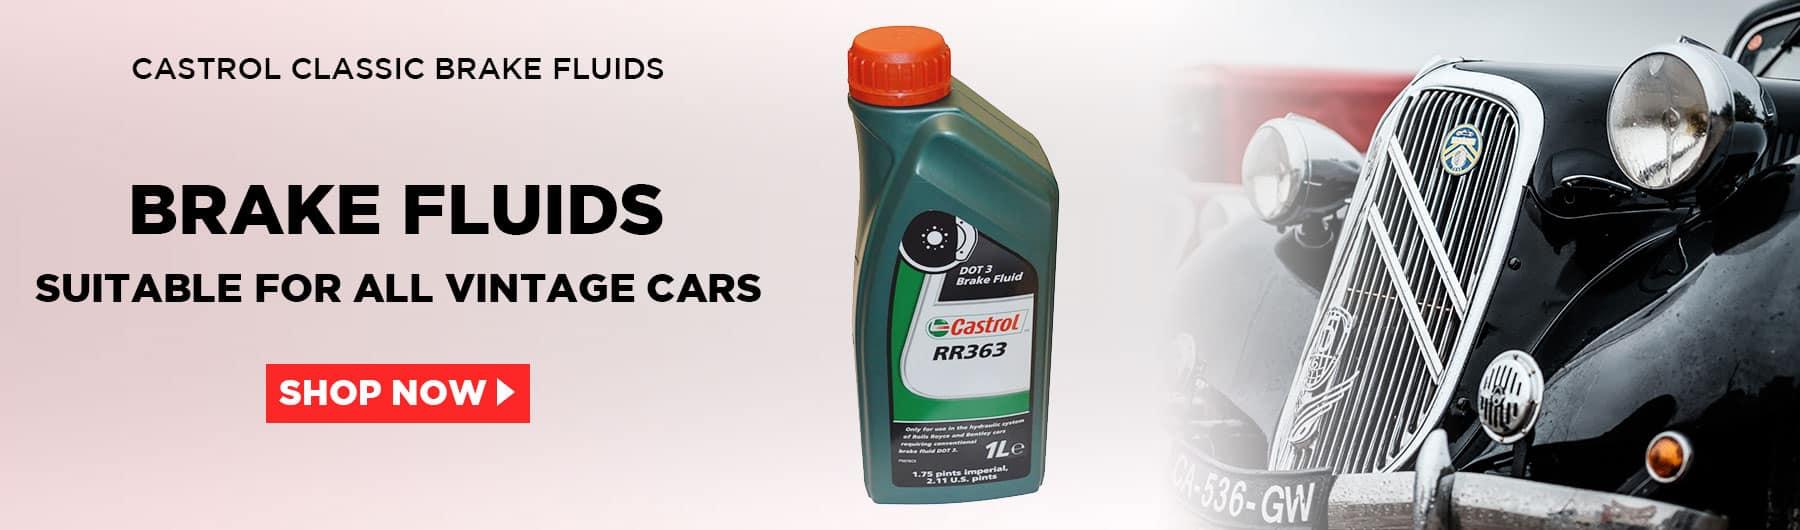 Carrousel-homepage-brake-fluids